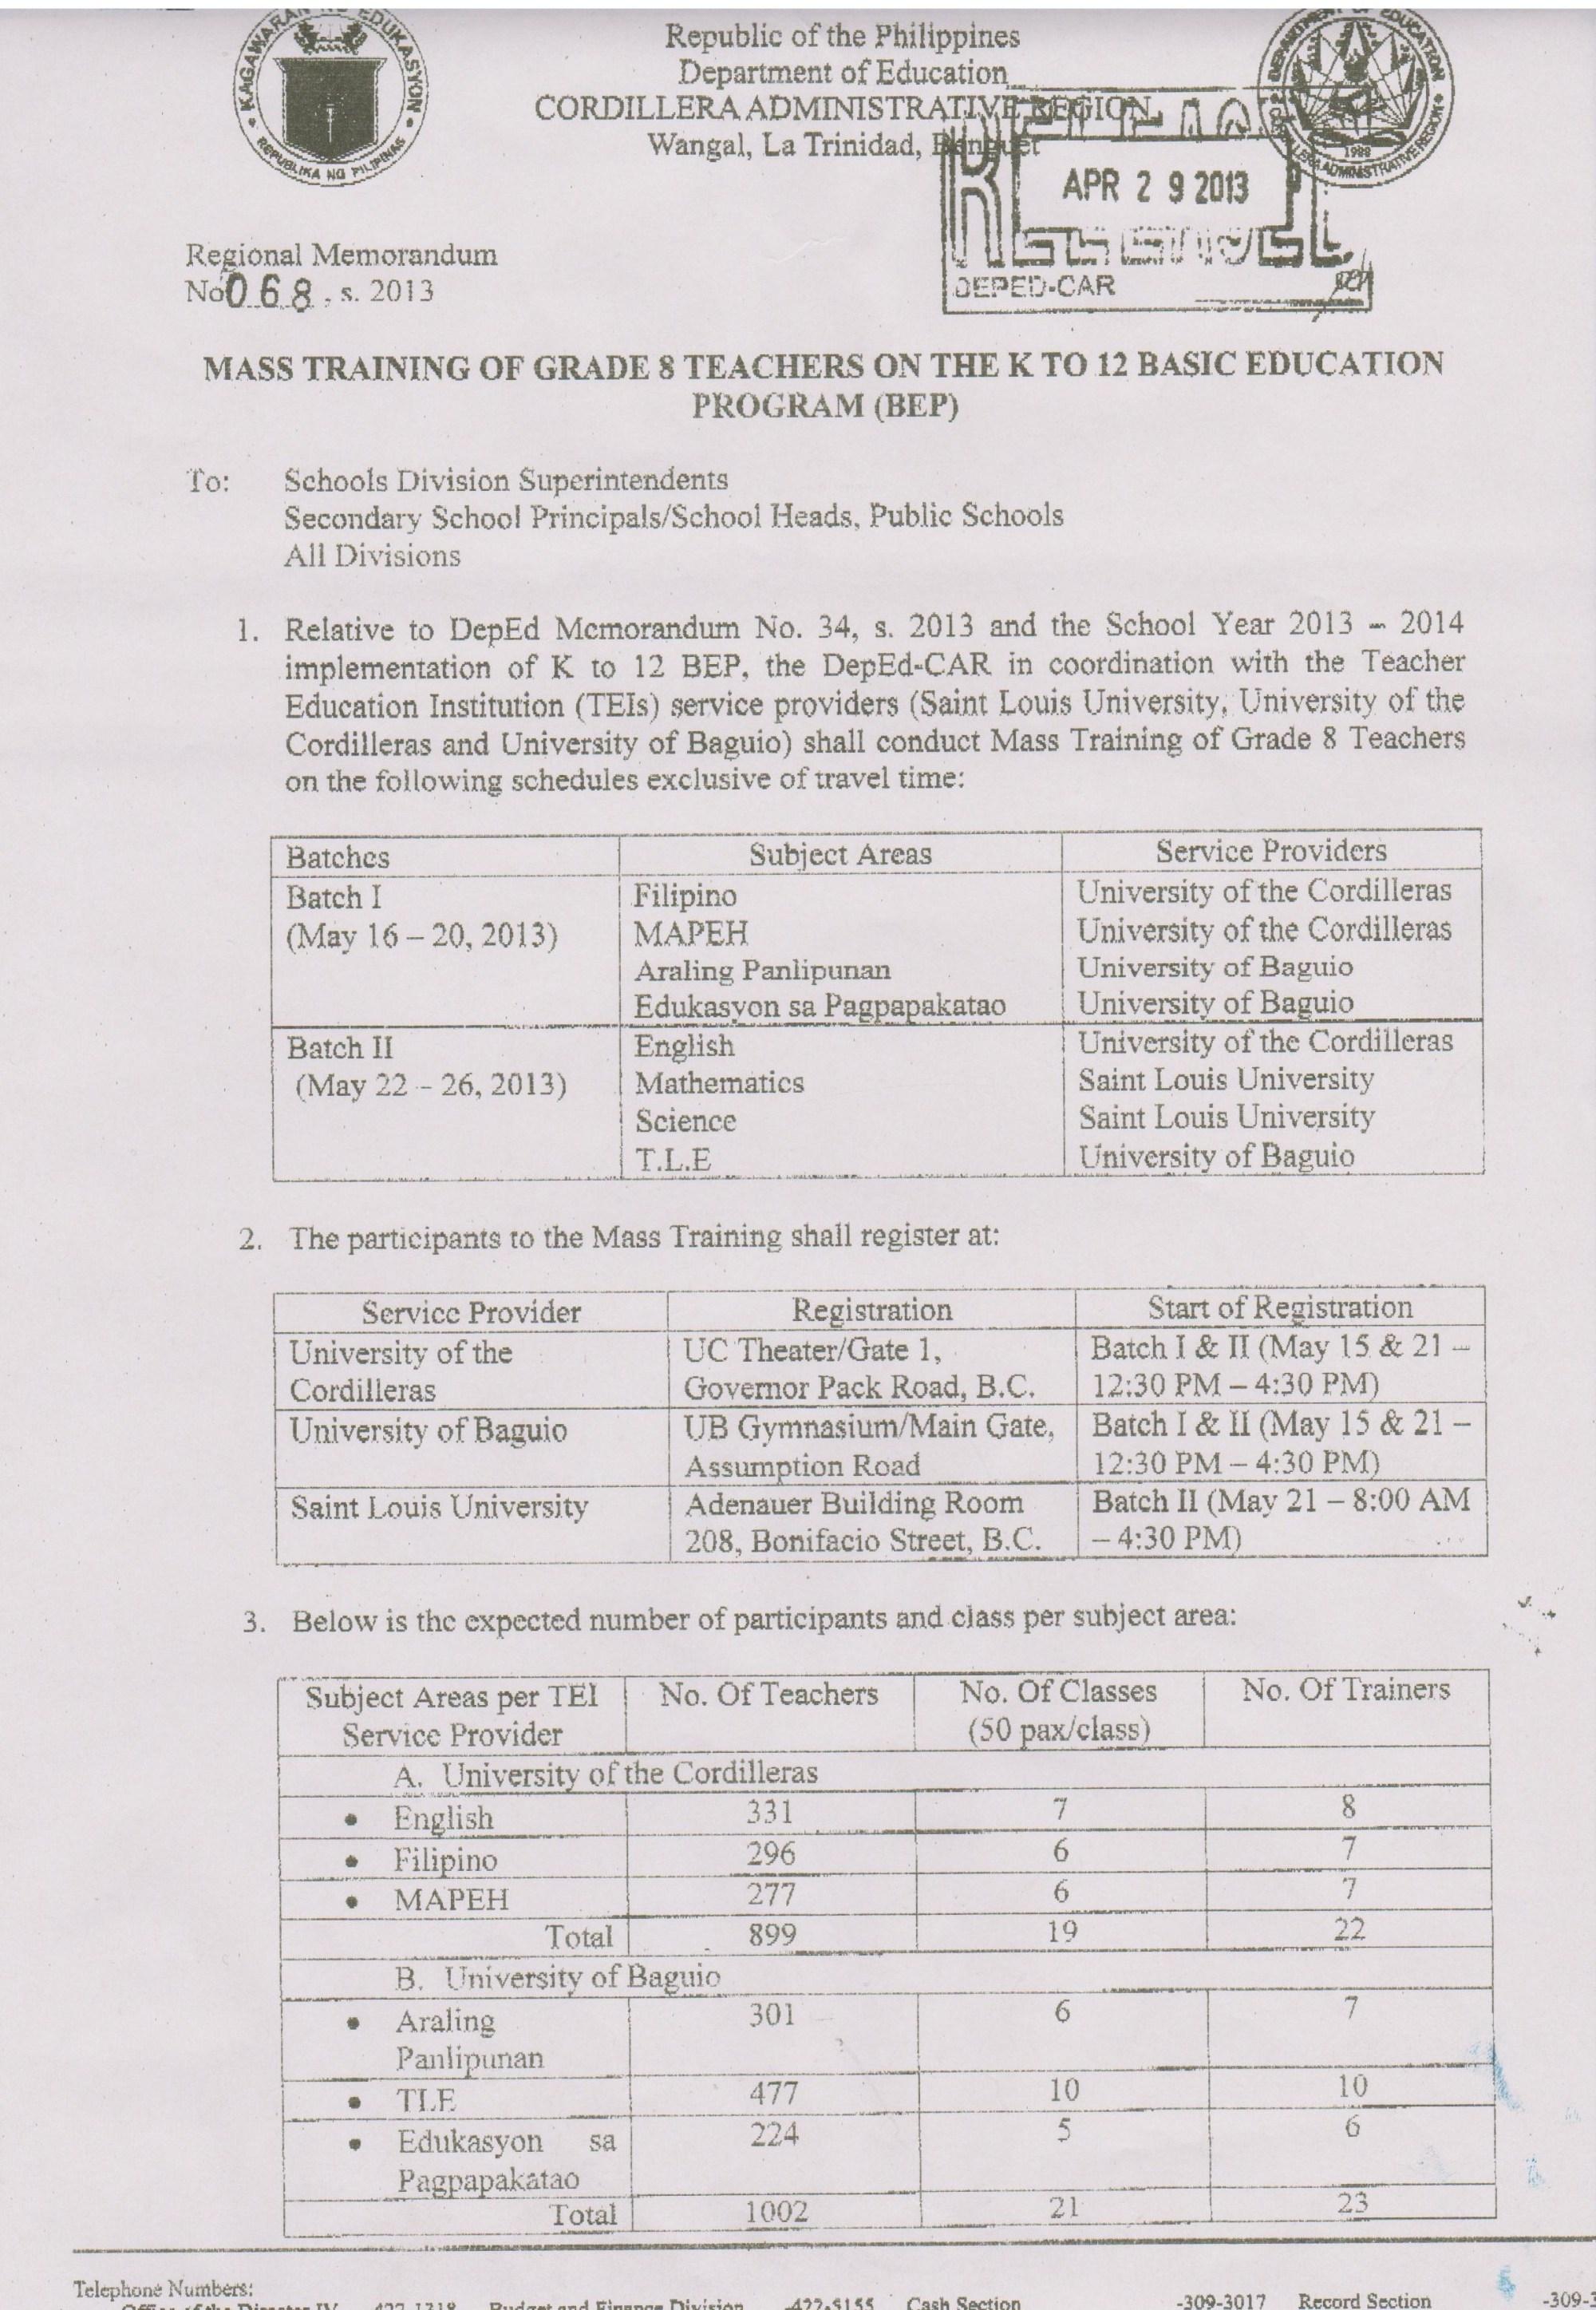 hight resolution of Regional Memo No. 68 S. 2013 Mass Training of Grade 8 Teachers on the K to  12 Basic Education Program (BEP)